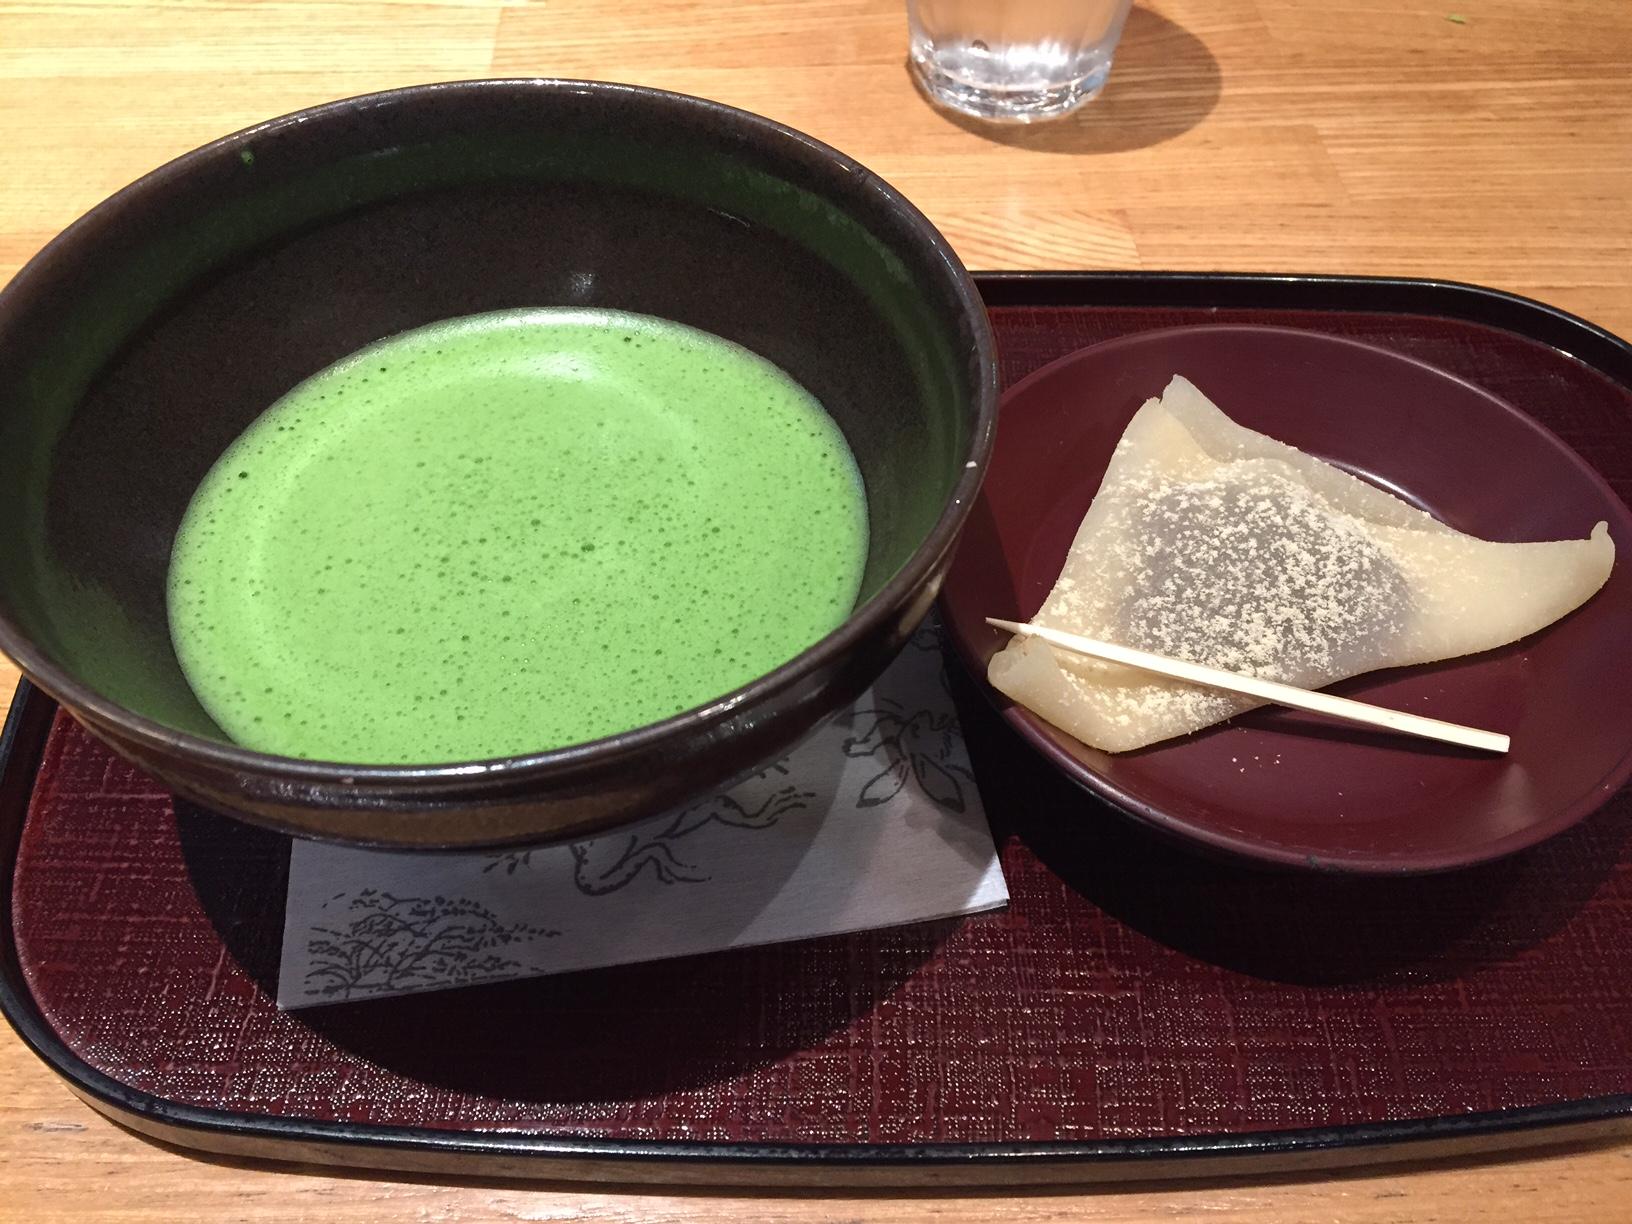 7京都駅 お抹茶2015